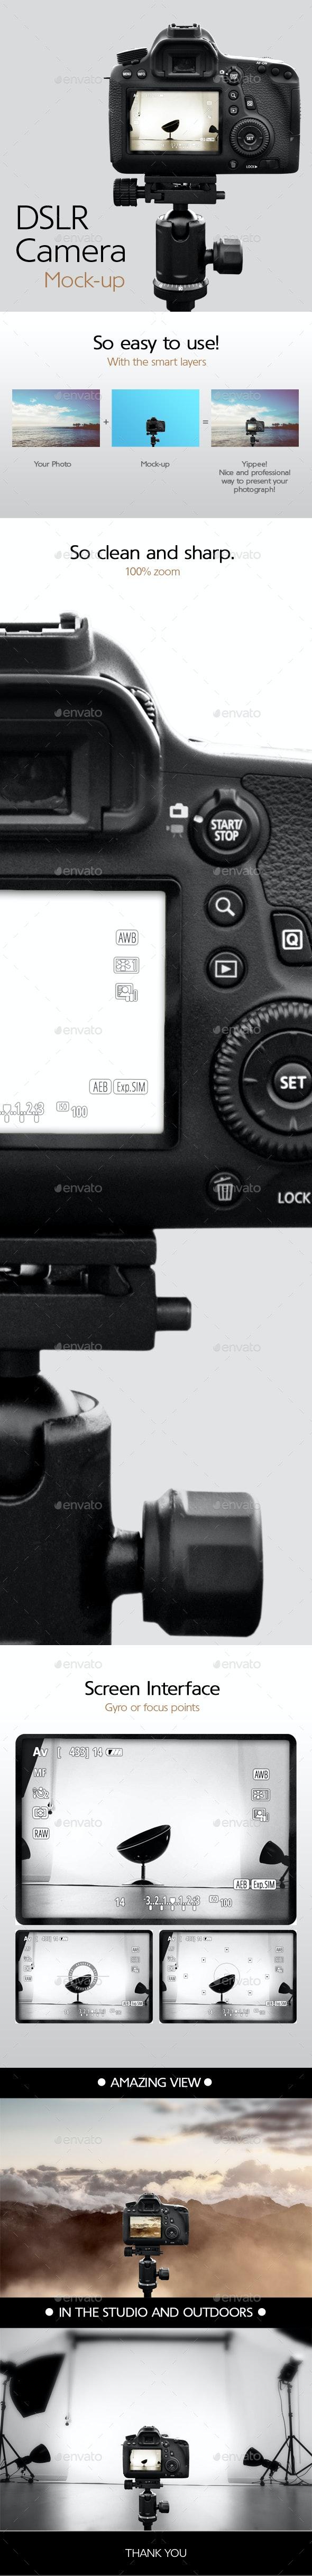 Camera on a Tripod Mock-up - Displays Product Mock-Ups